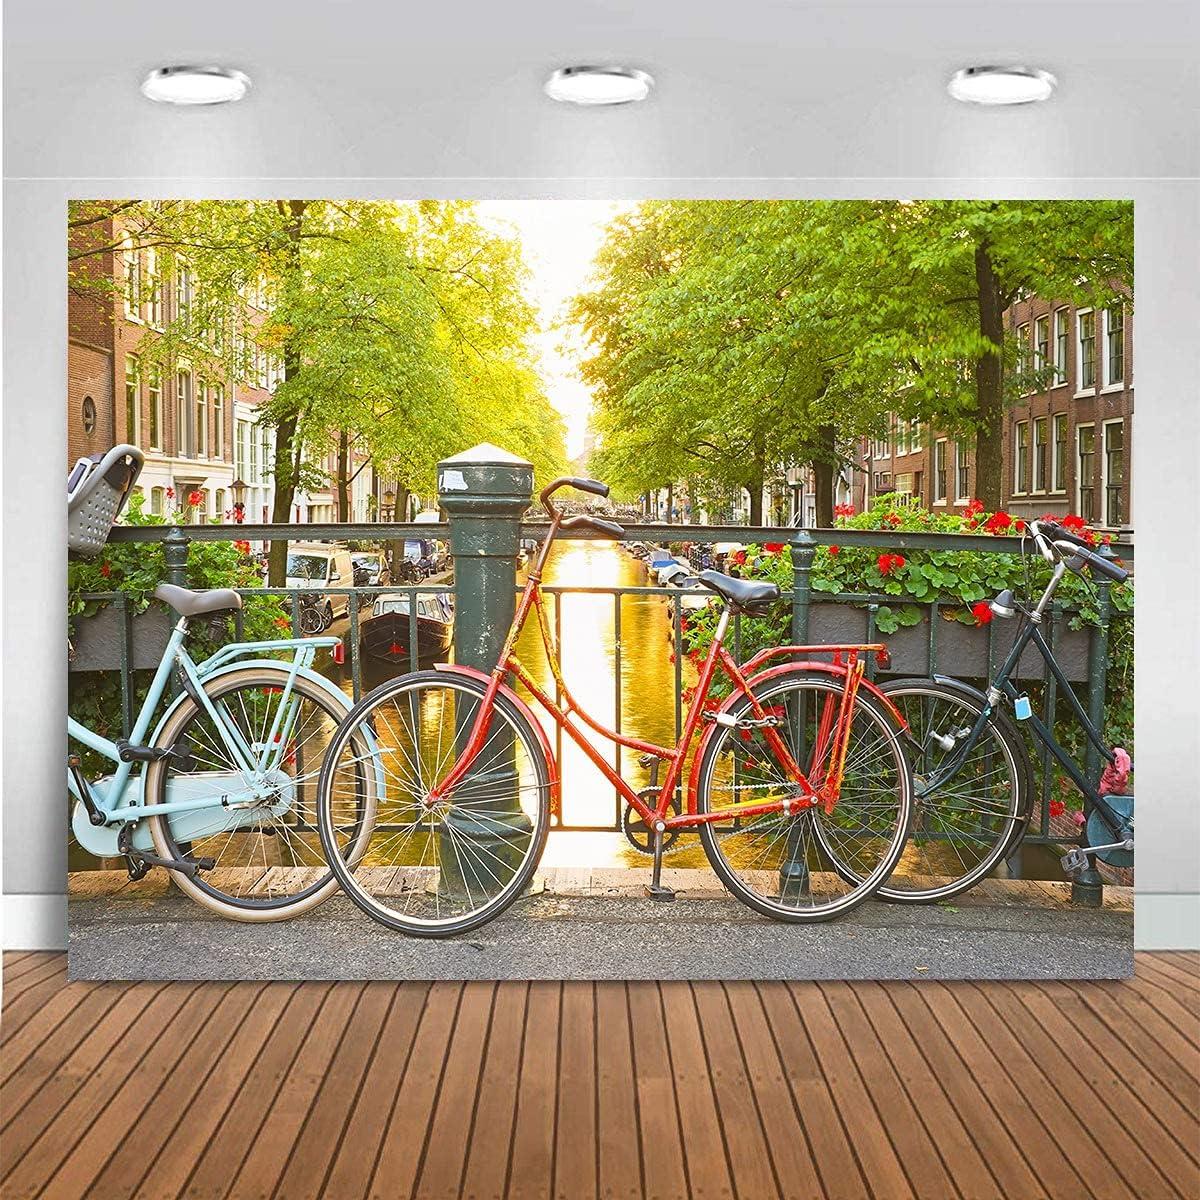 Zhushj'shop Photoshoot Department store Studio Discount is also underway Props Vehicle Ship Plan Bike Theme